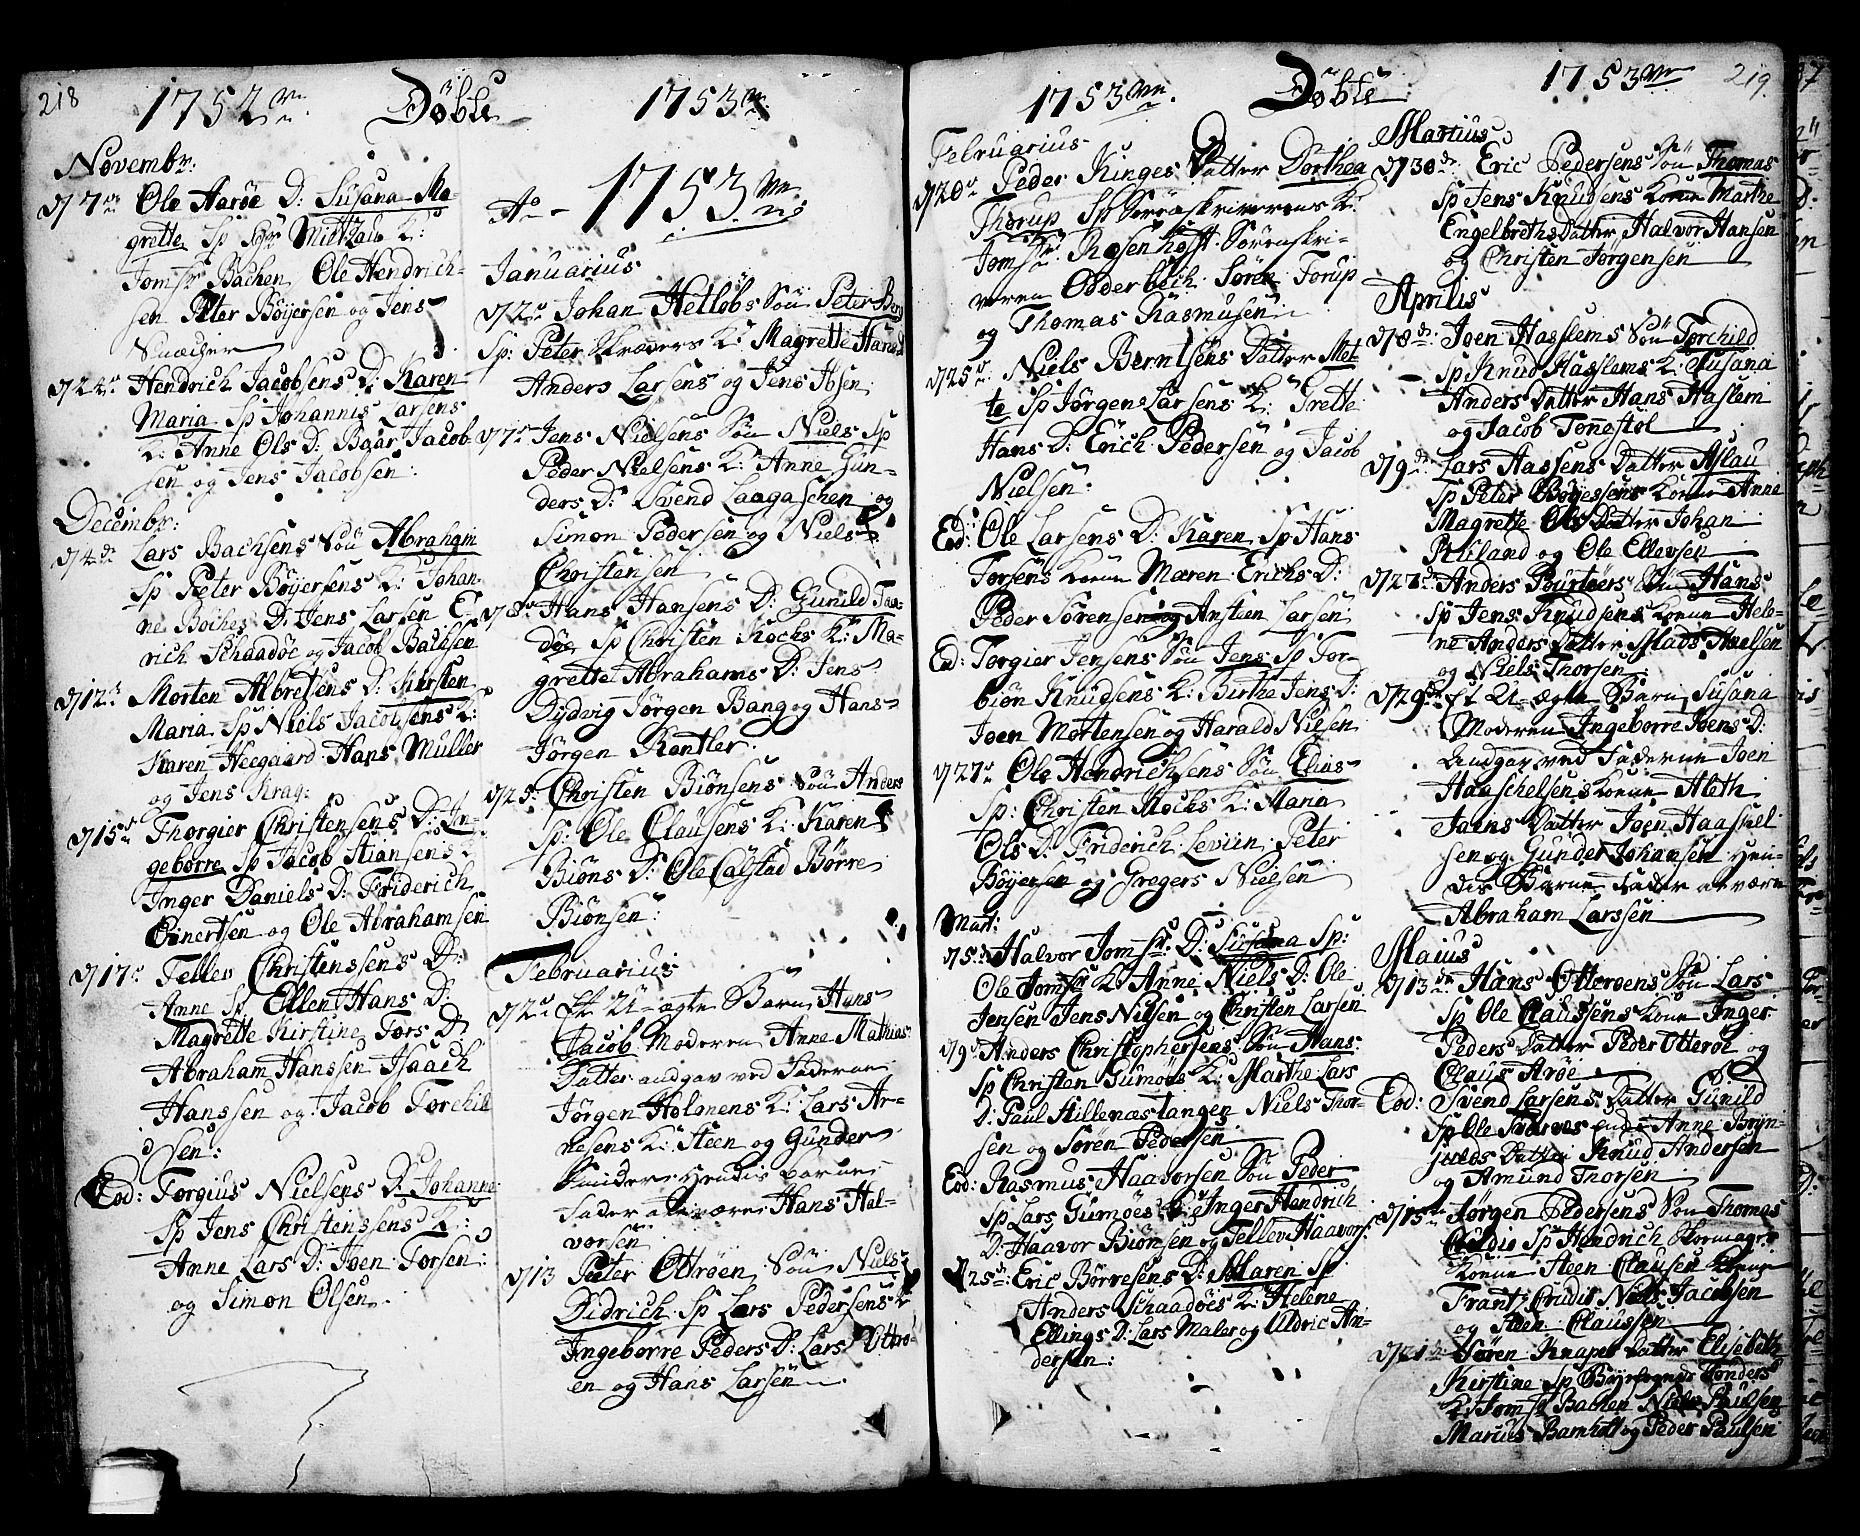 SAKO, Kragerø kirkebøker, F/Fa/L0001: Ministerialbok nr. 1, 1702-1766, s. 218-219